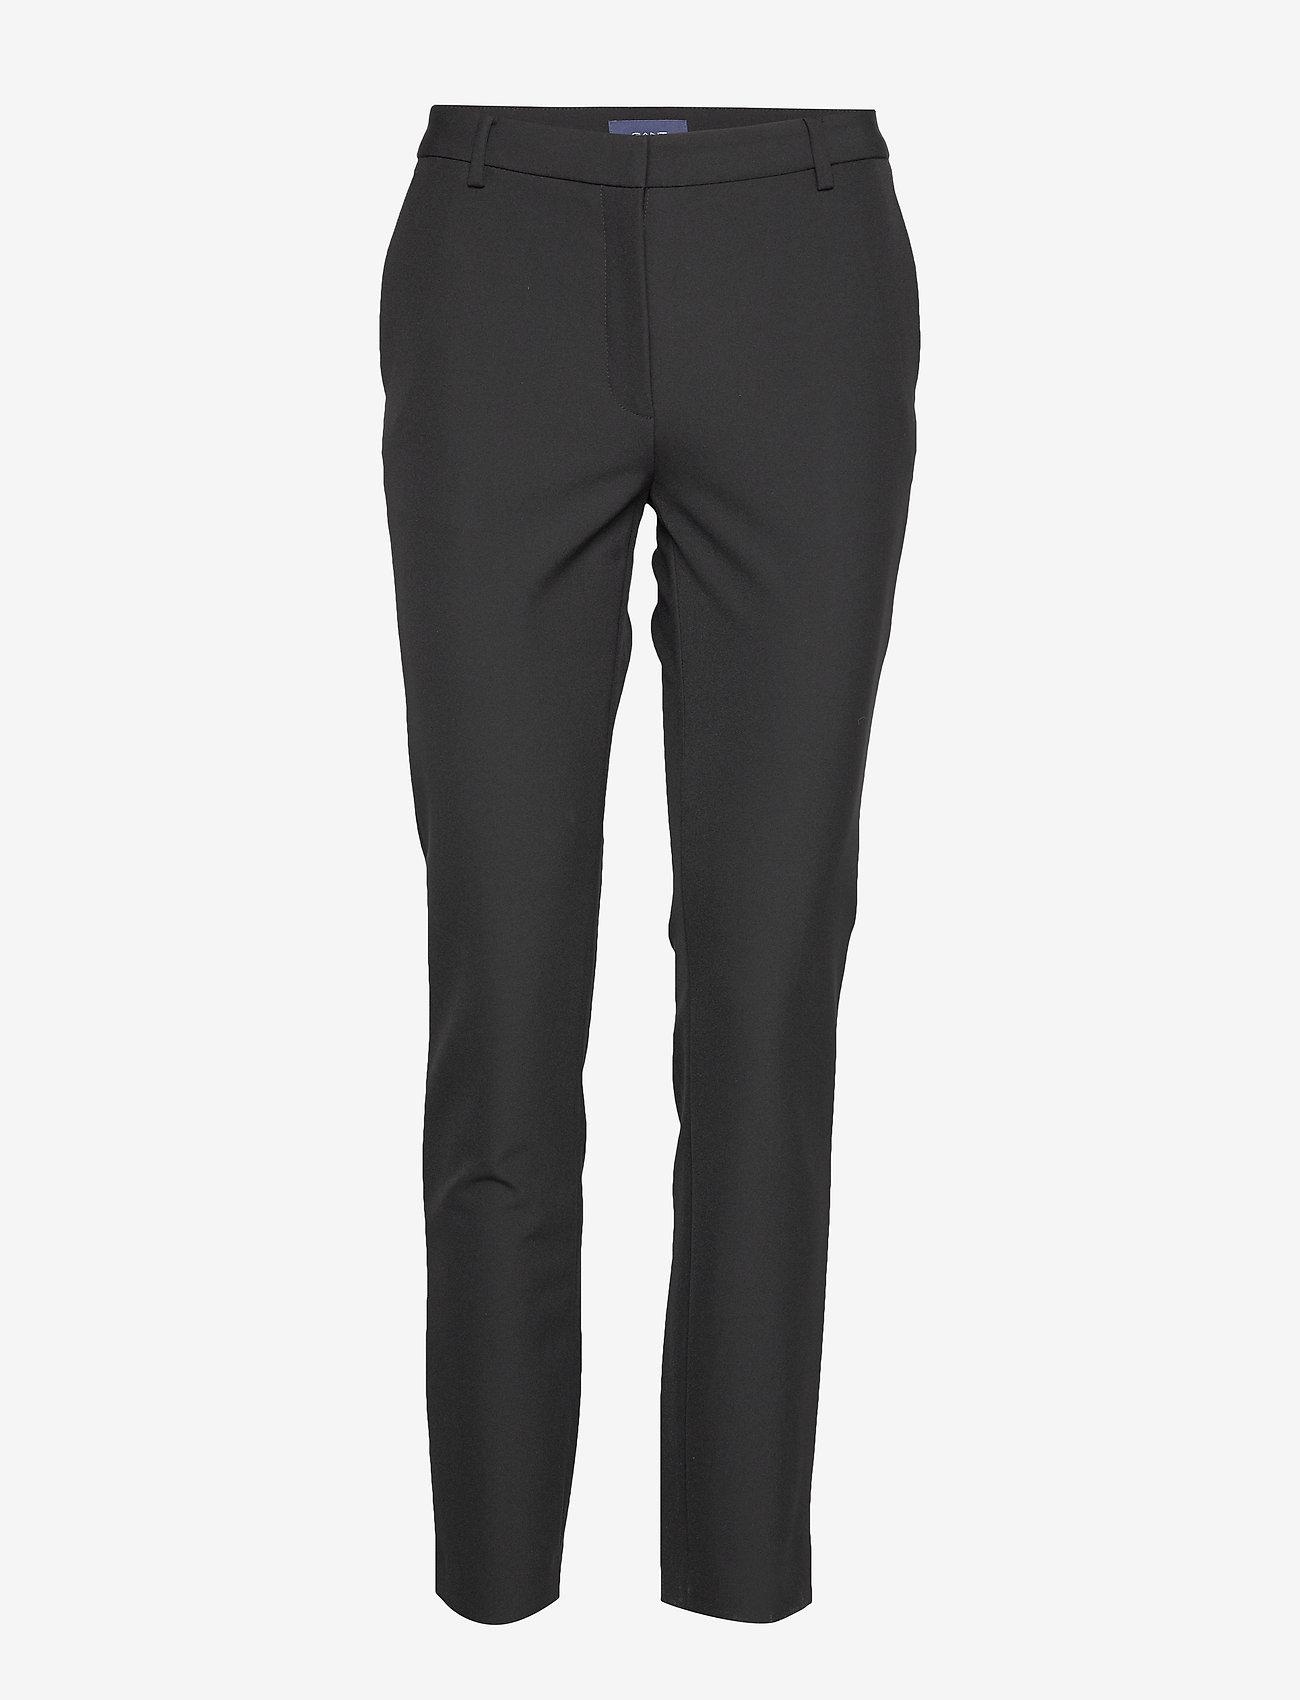 Gant - D1. STRETCH TAPERED PANT - suorat housut - black